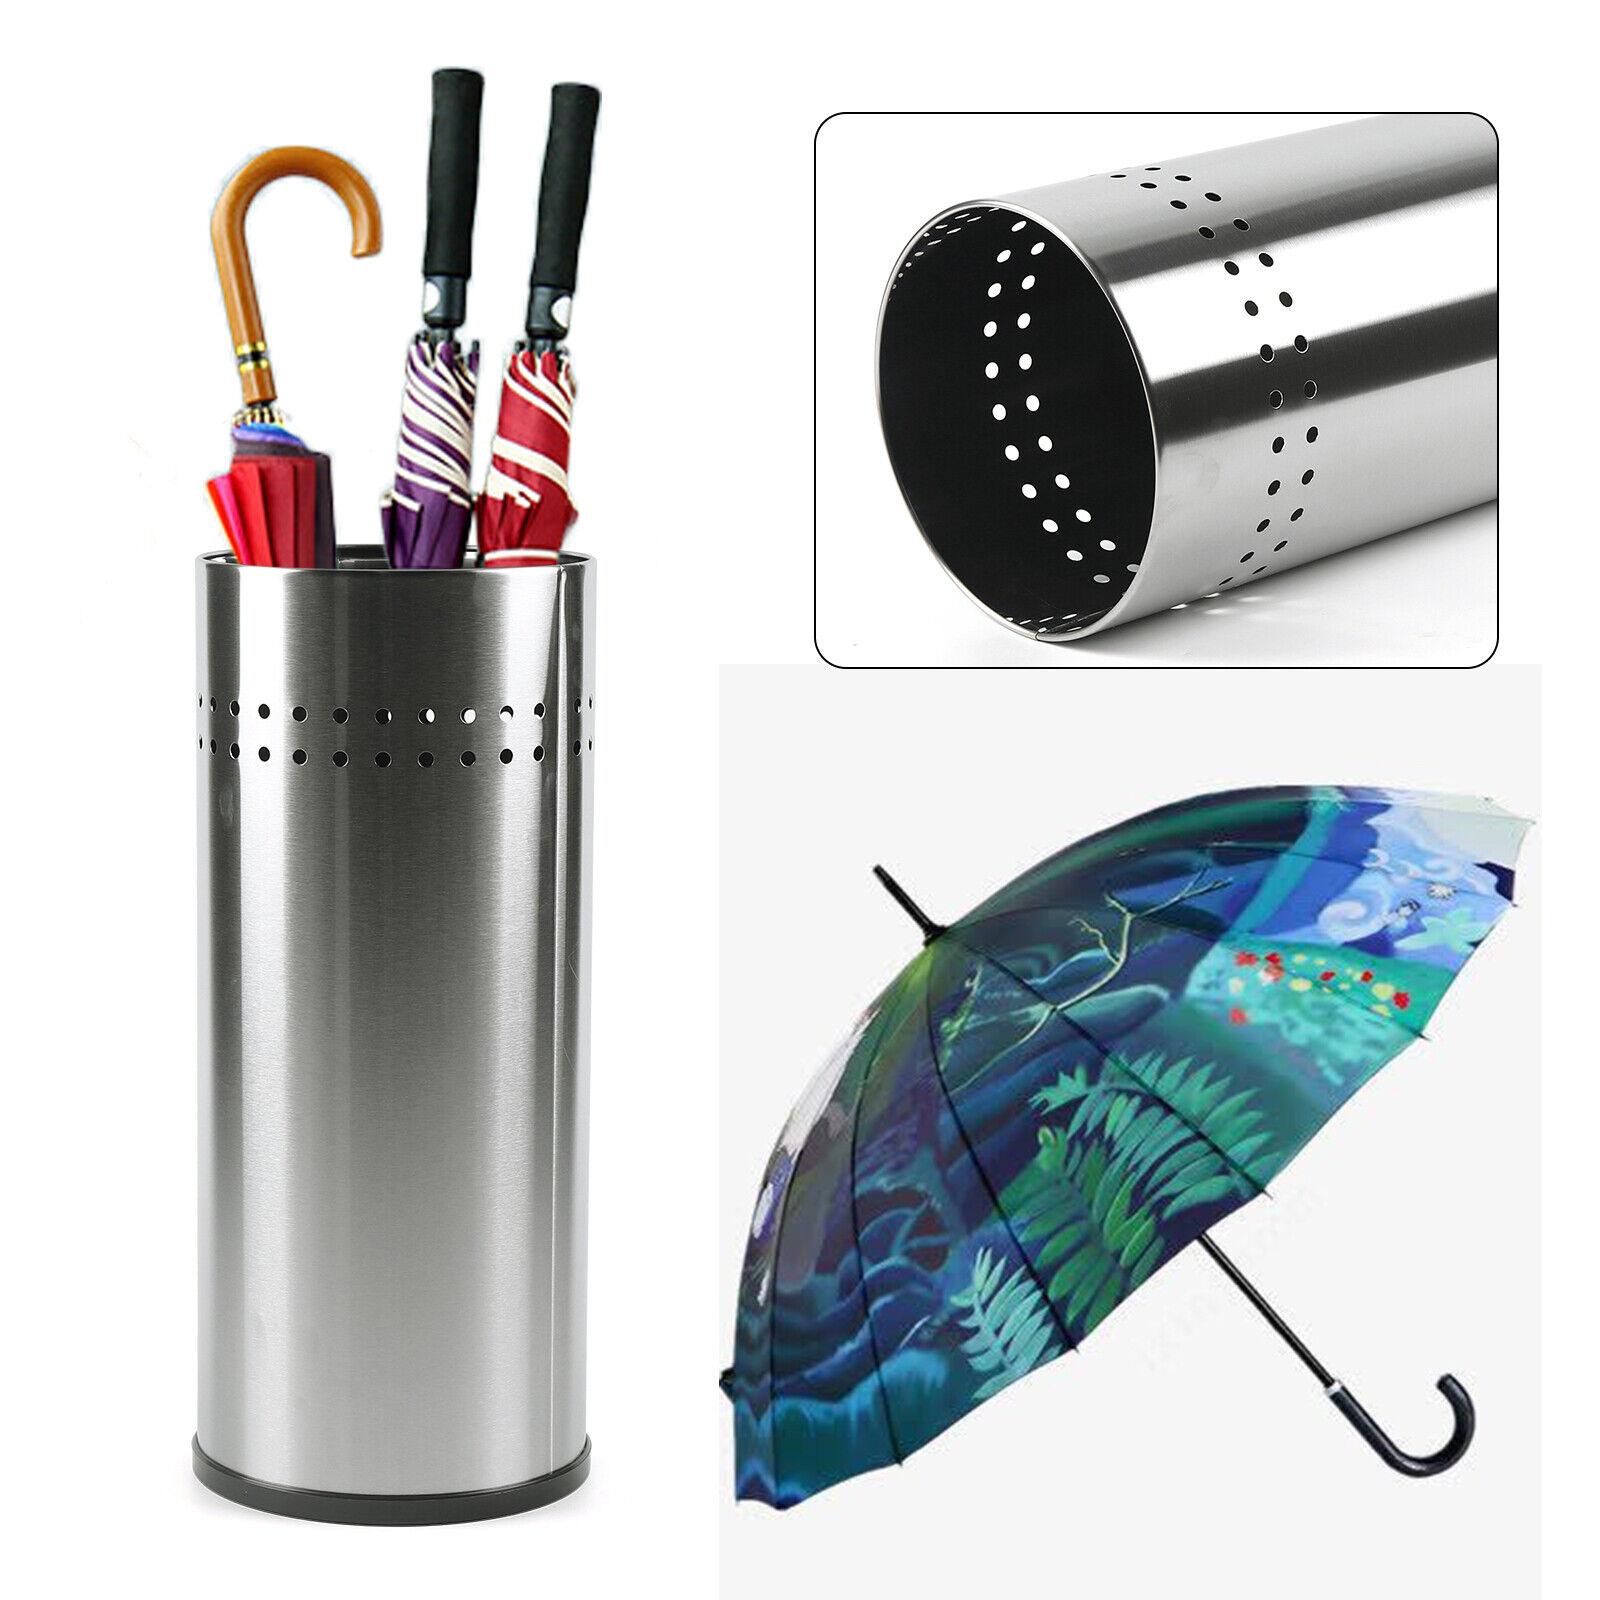 Hallway Drain Stand Umbrella Holder Rain Storage Rack Bucket For Office Home49.9